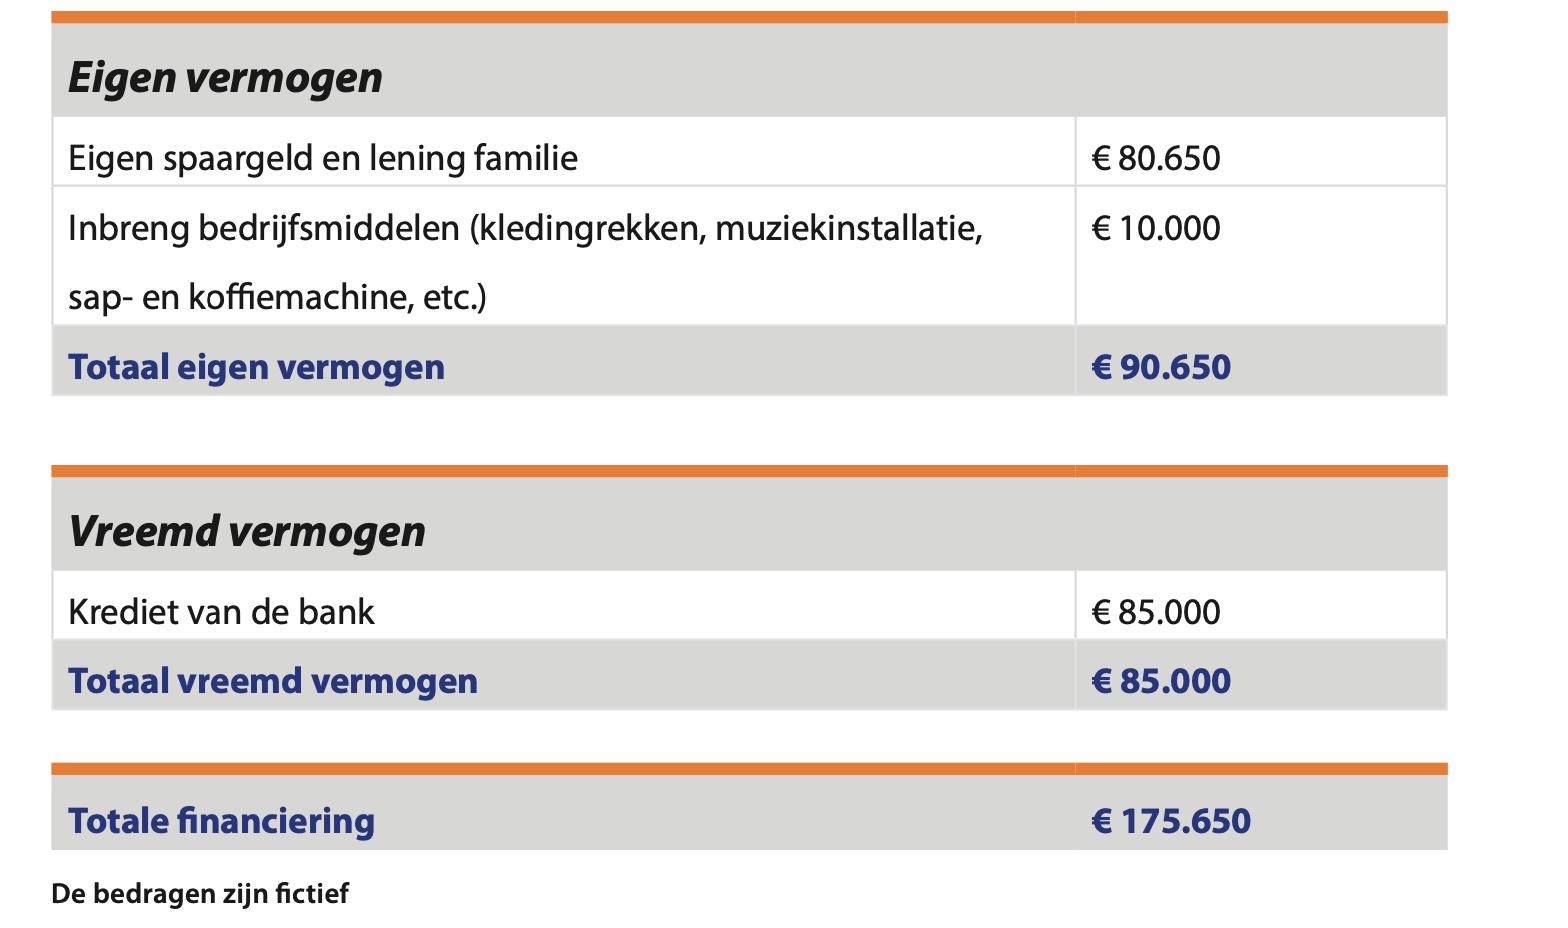 Voorbeeld financieringsbegroting